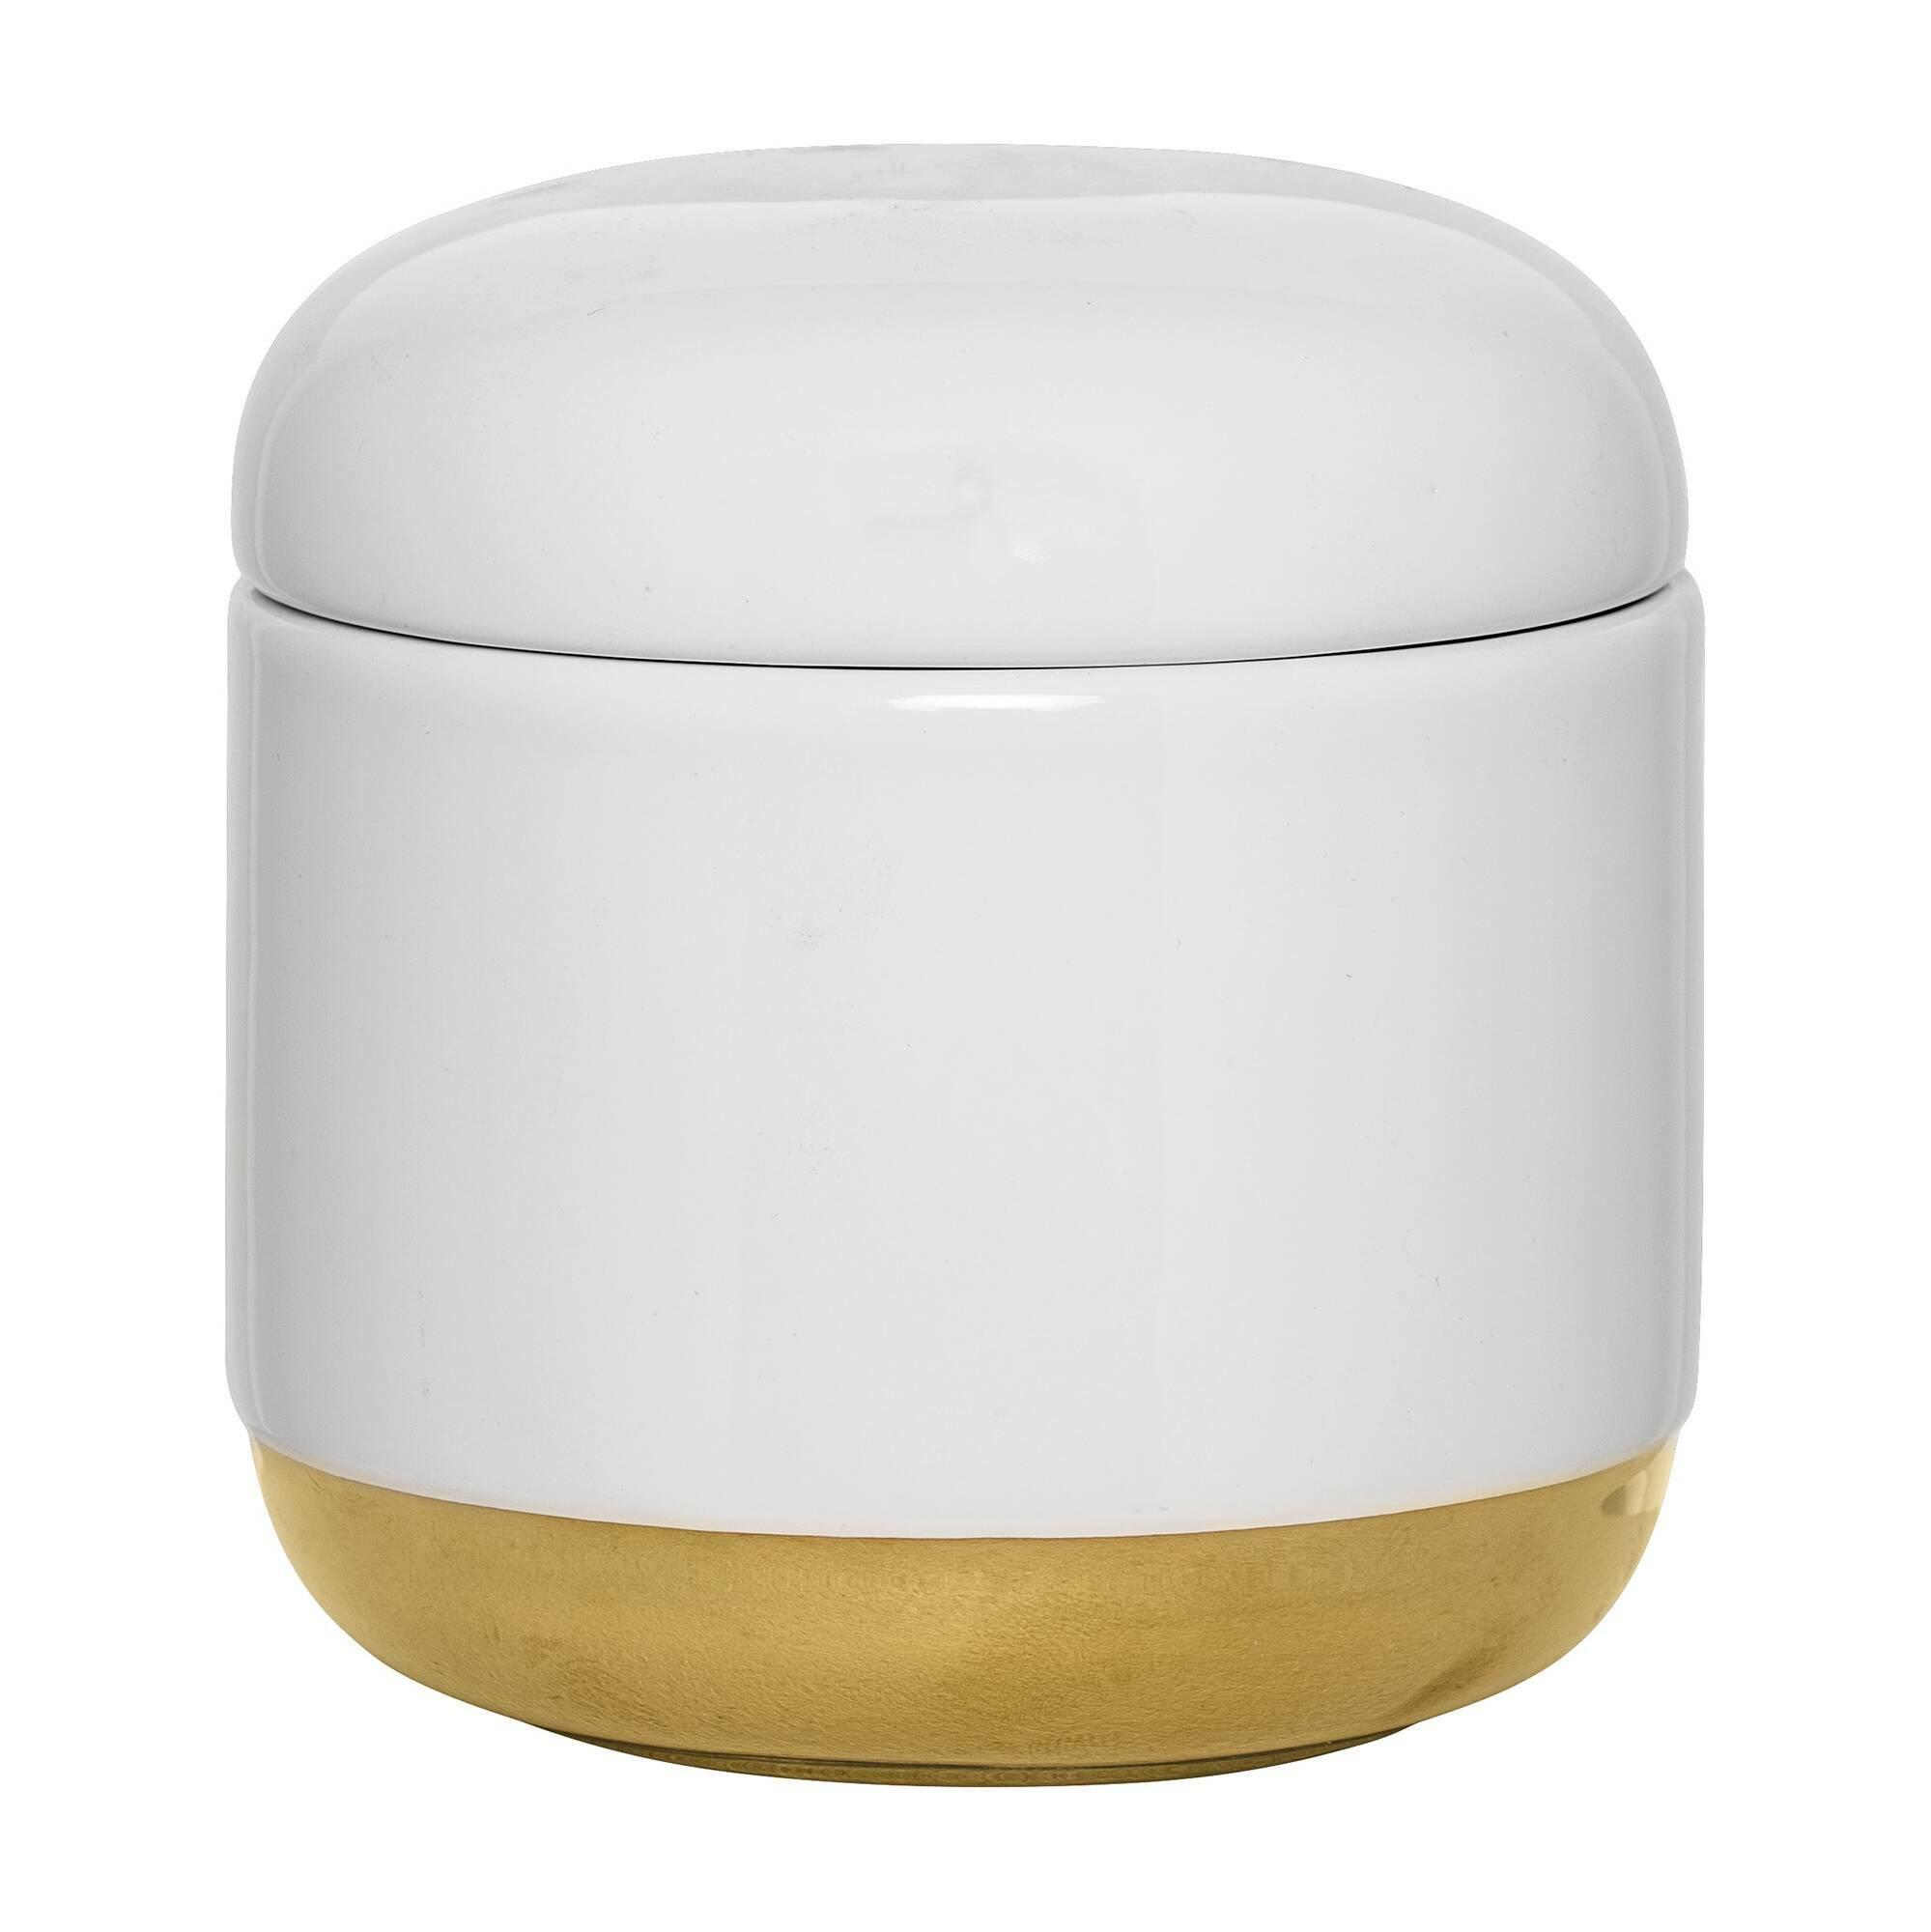 Емкость для хранения с крышкой White &amp; GoldРазное<br><br><br>stock: 1<br>Высота: 11<br>Материал: Керамика<br>Цвет: Белый<br>Диаметр: 10,5